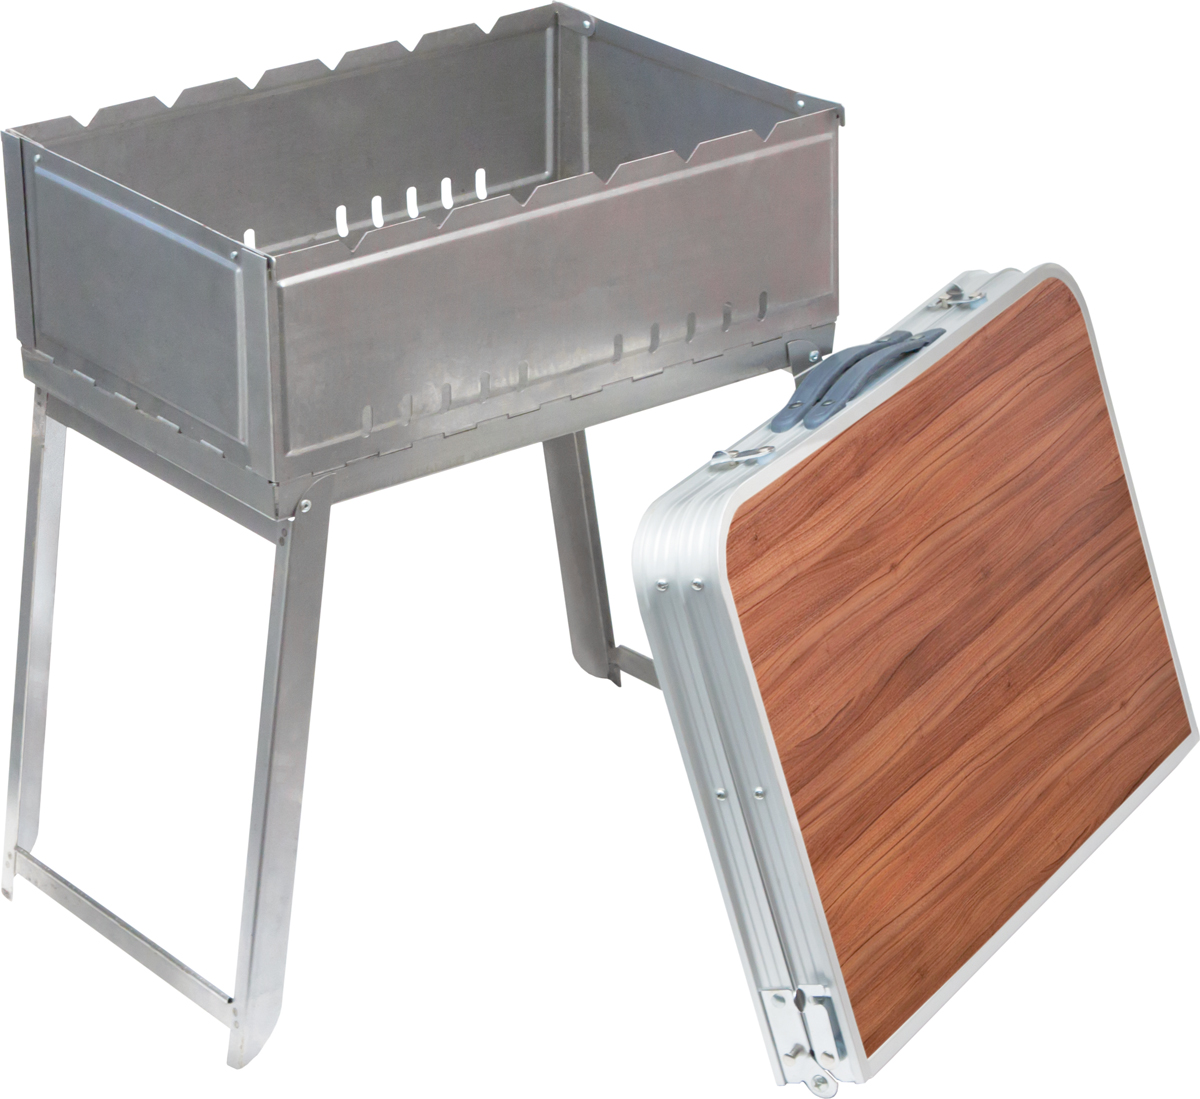 Стол-чемодан ПИКНИЧОК, с мангалом, сумкой, 76 х 55 х 34,5 см сумка для мангала royalgrill 52 х 32 см 80 071